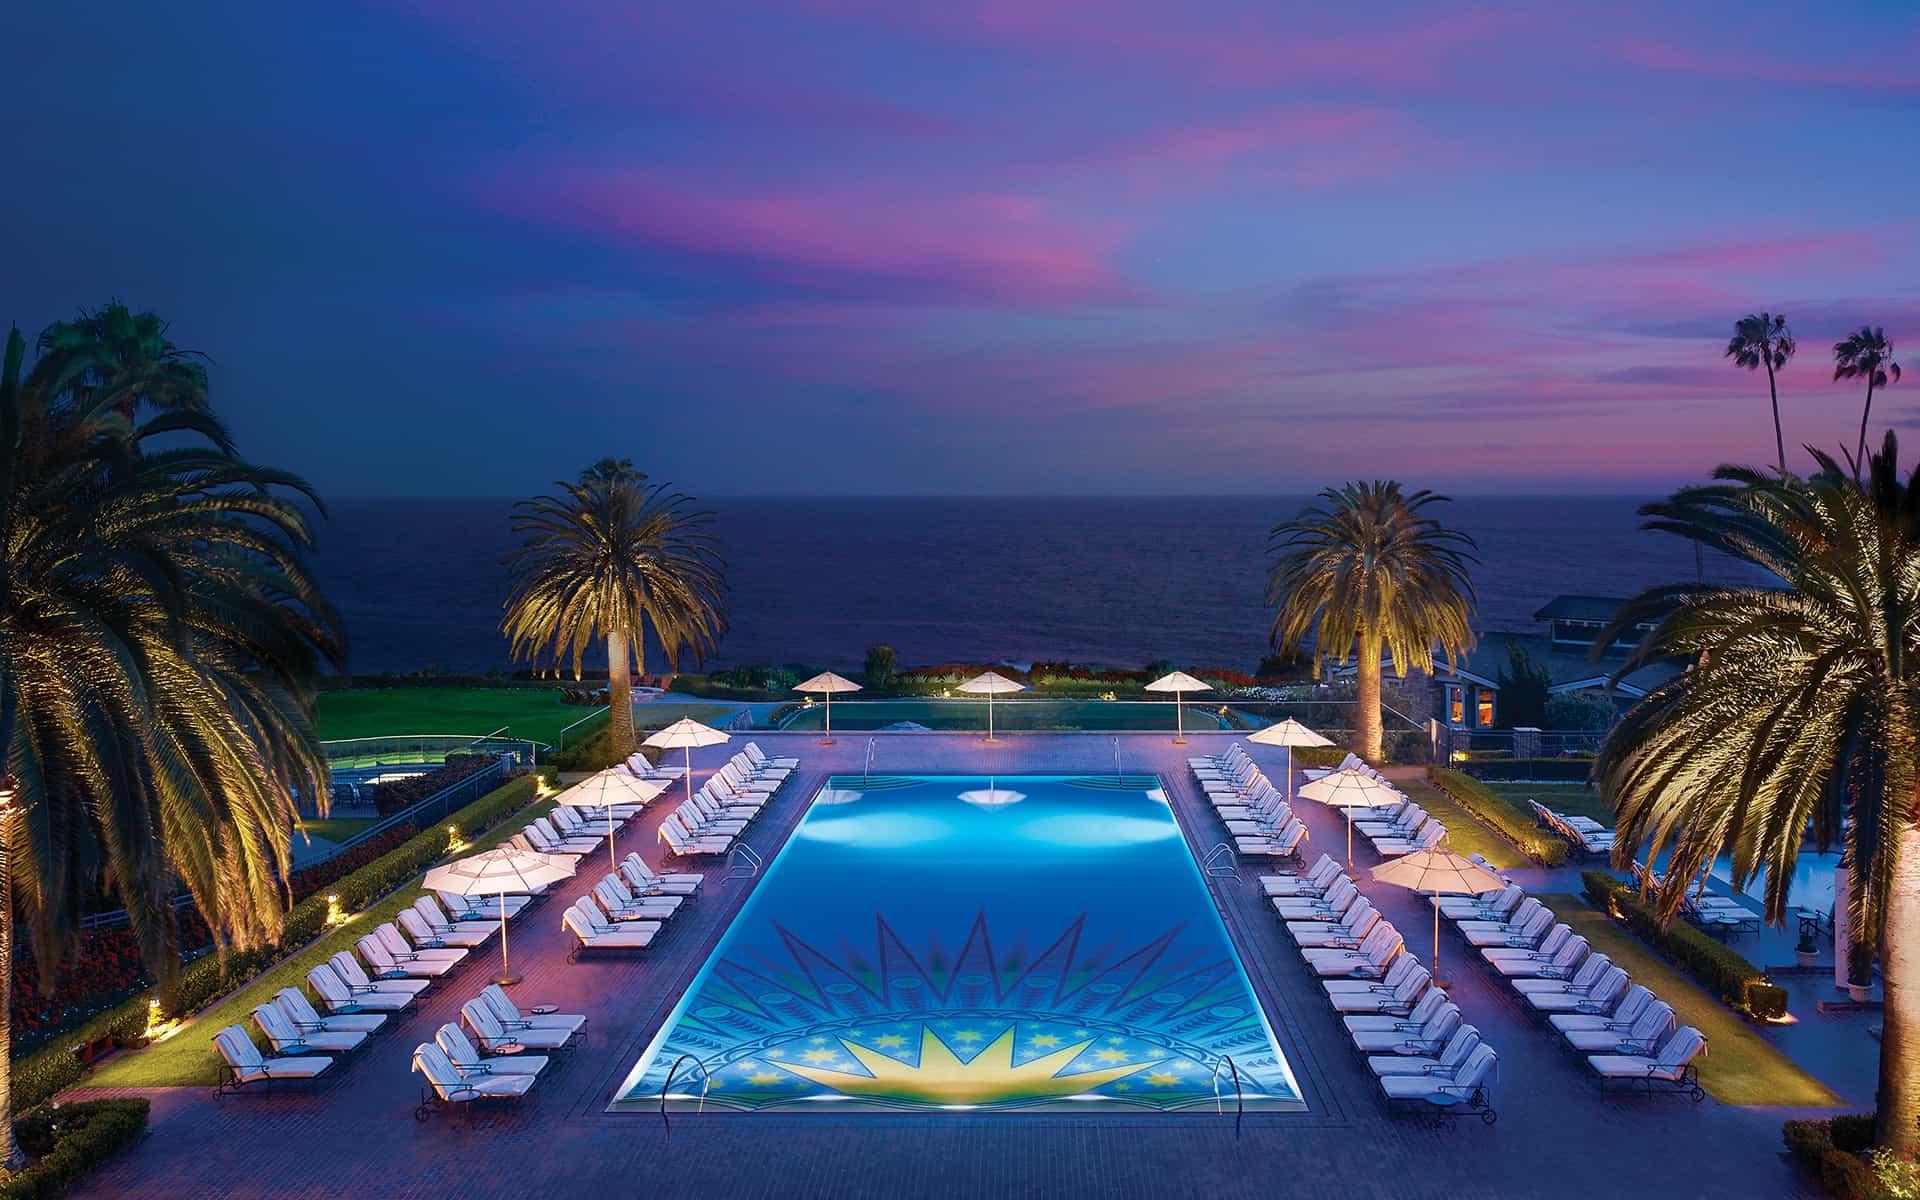 Laguna Beach Hotel Image Gallery | Montage Laguna Beach  Laguna Beach Ho...